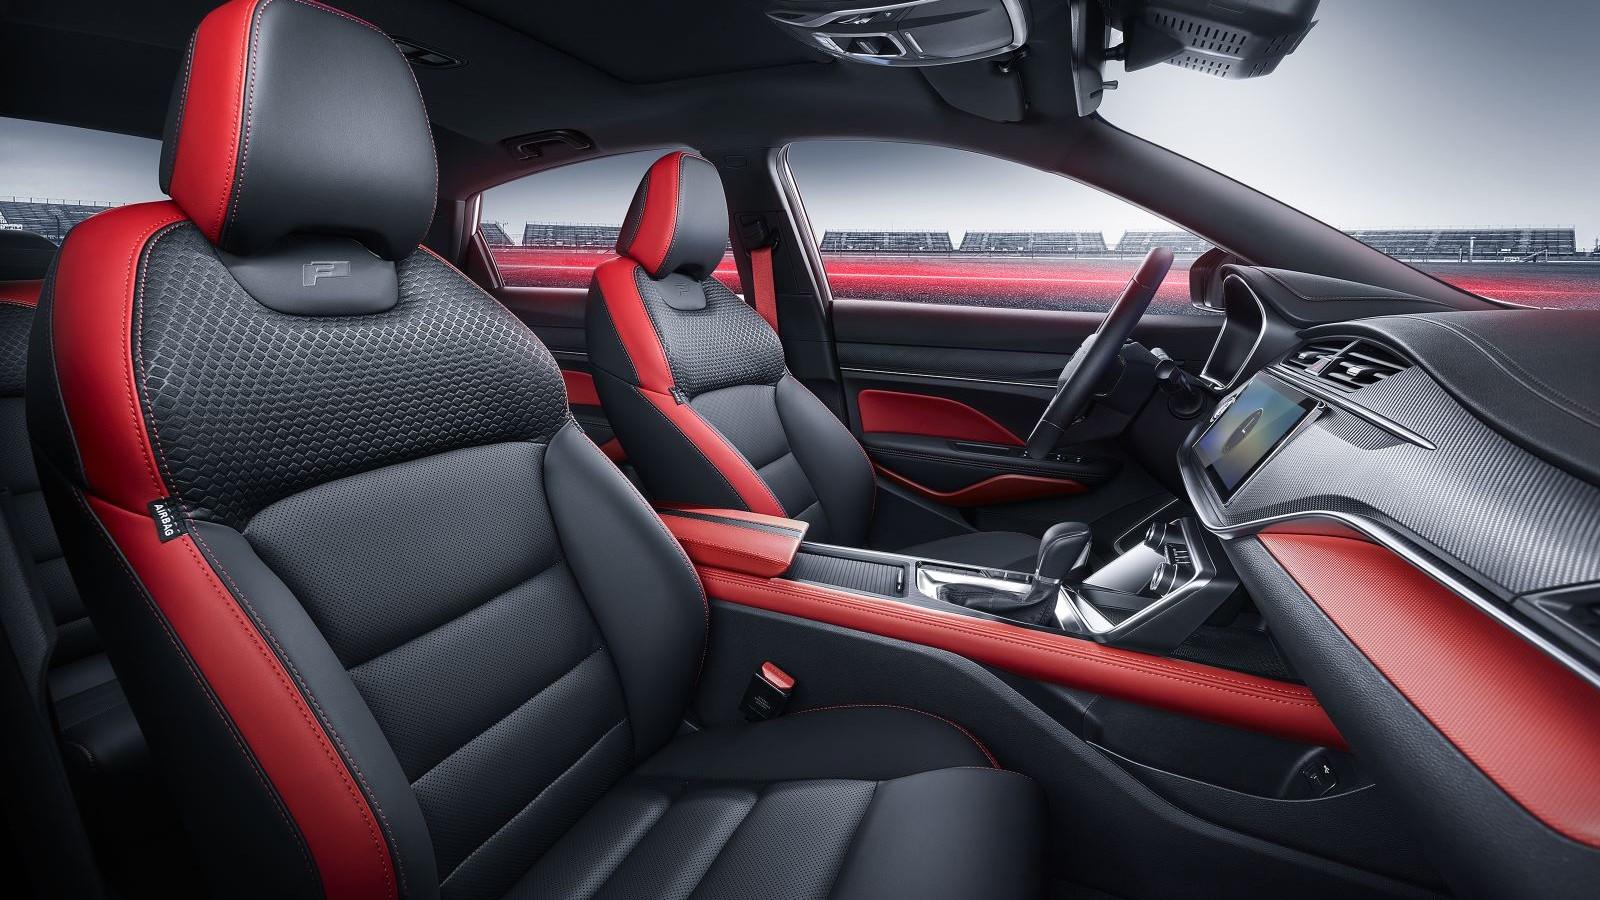 Салон красного автомобиля Geely Binray 2021